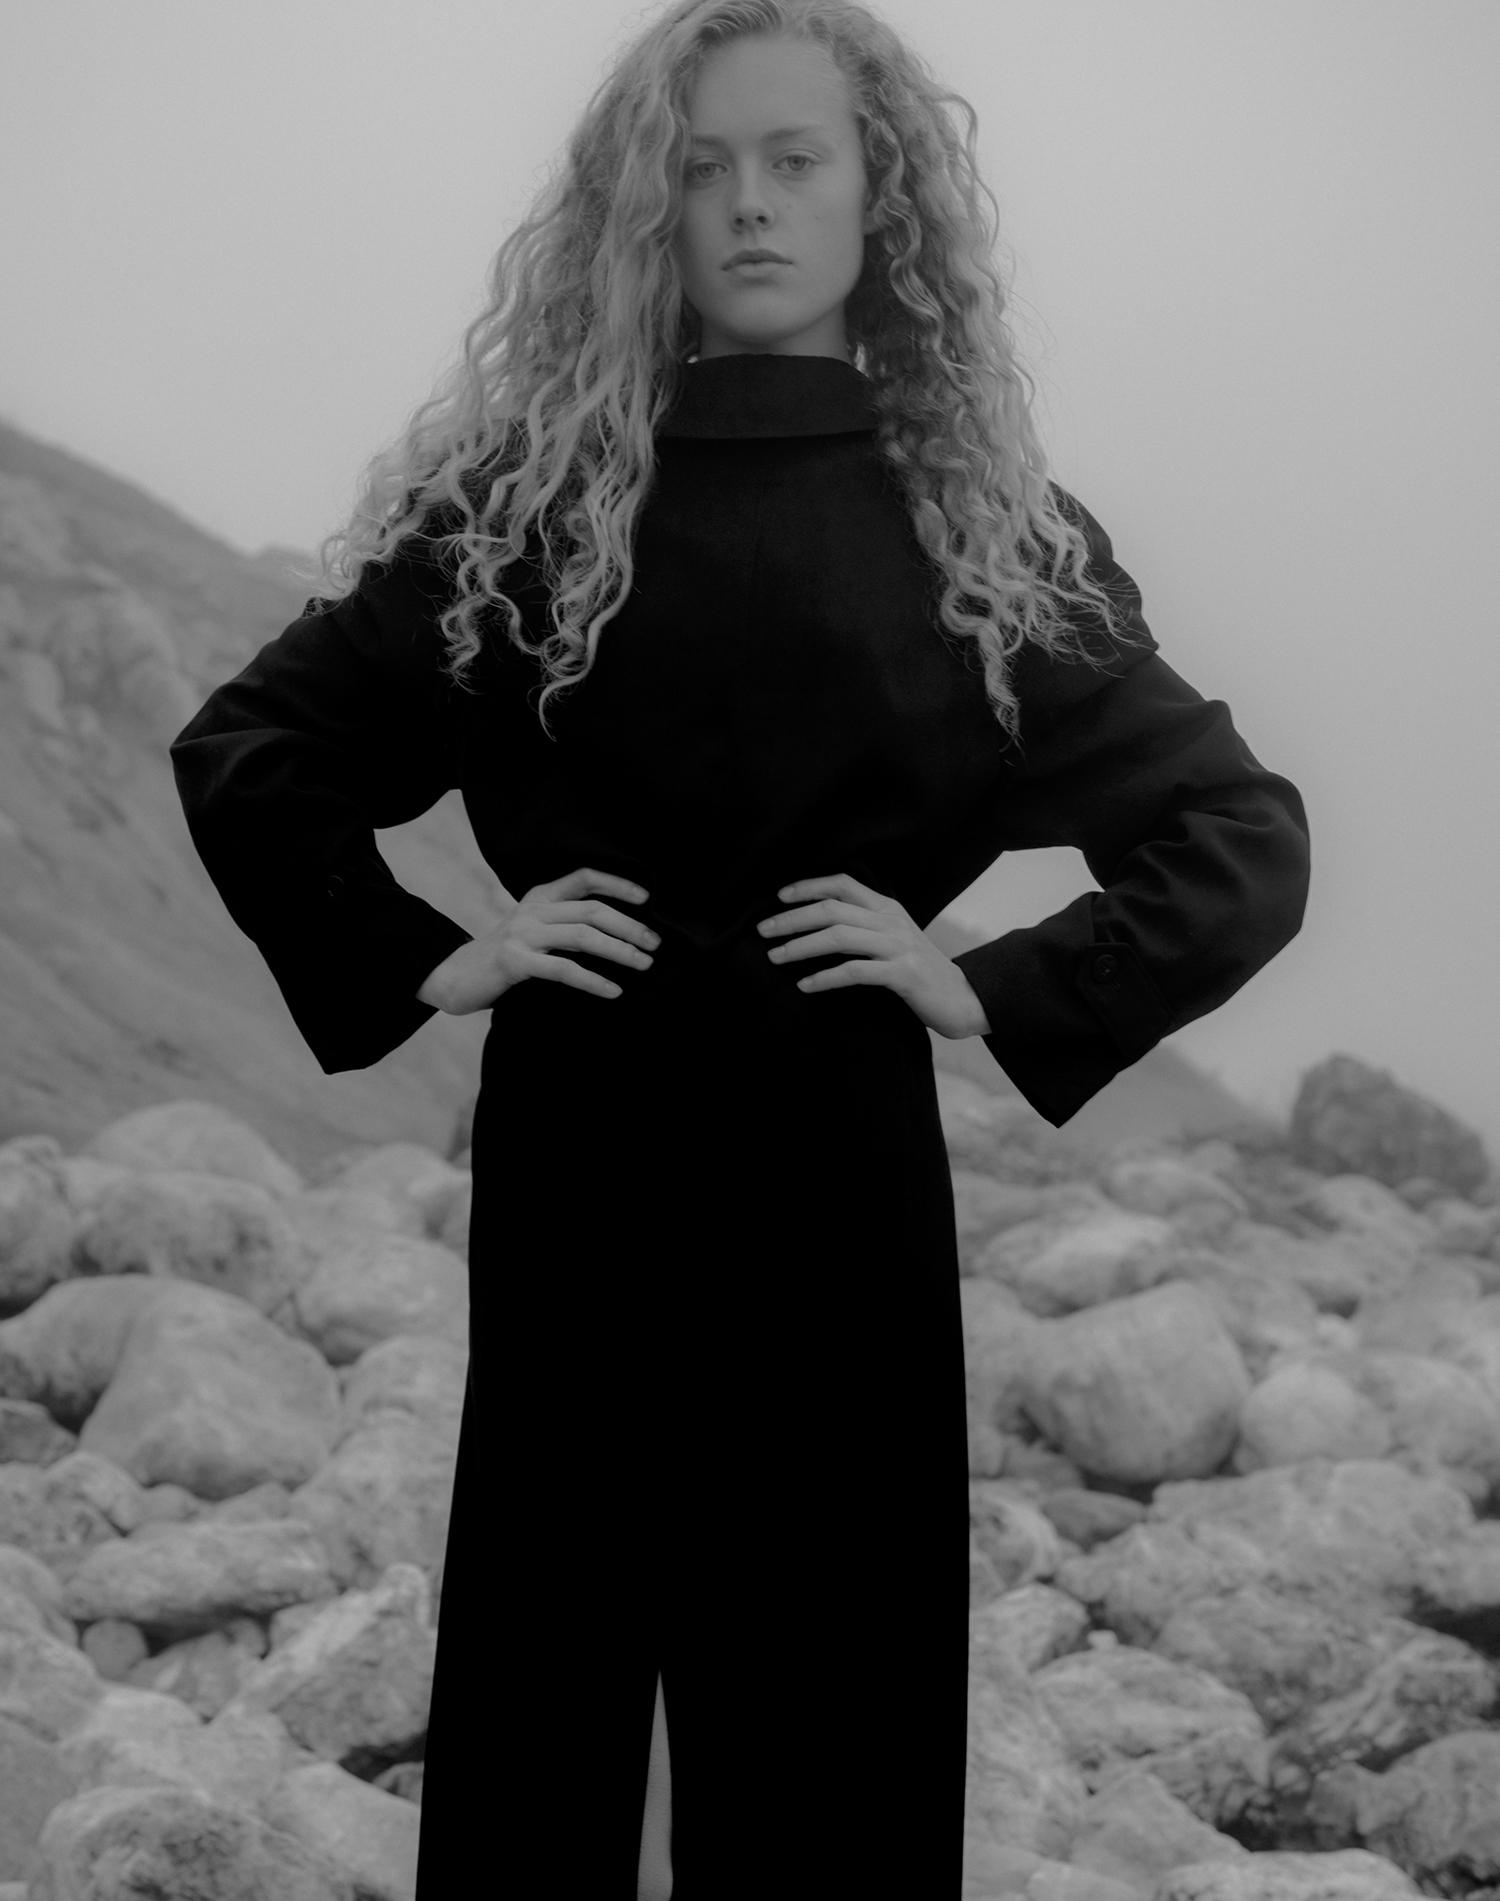 Anna Linetskaya